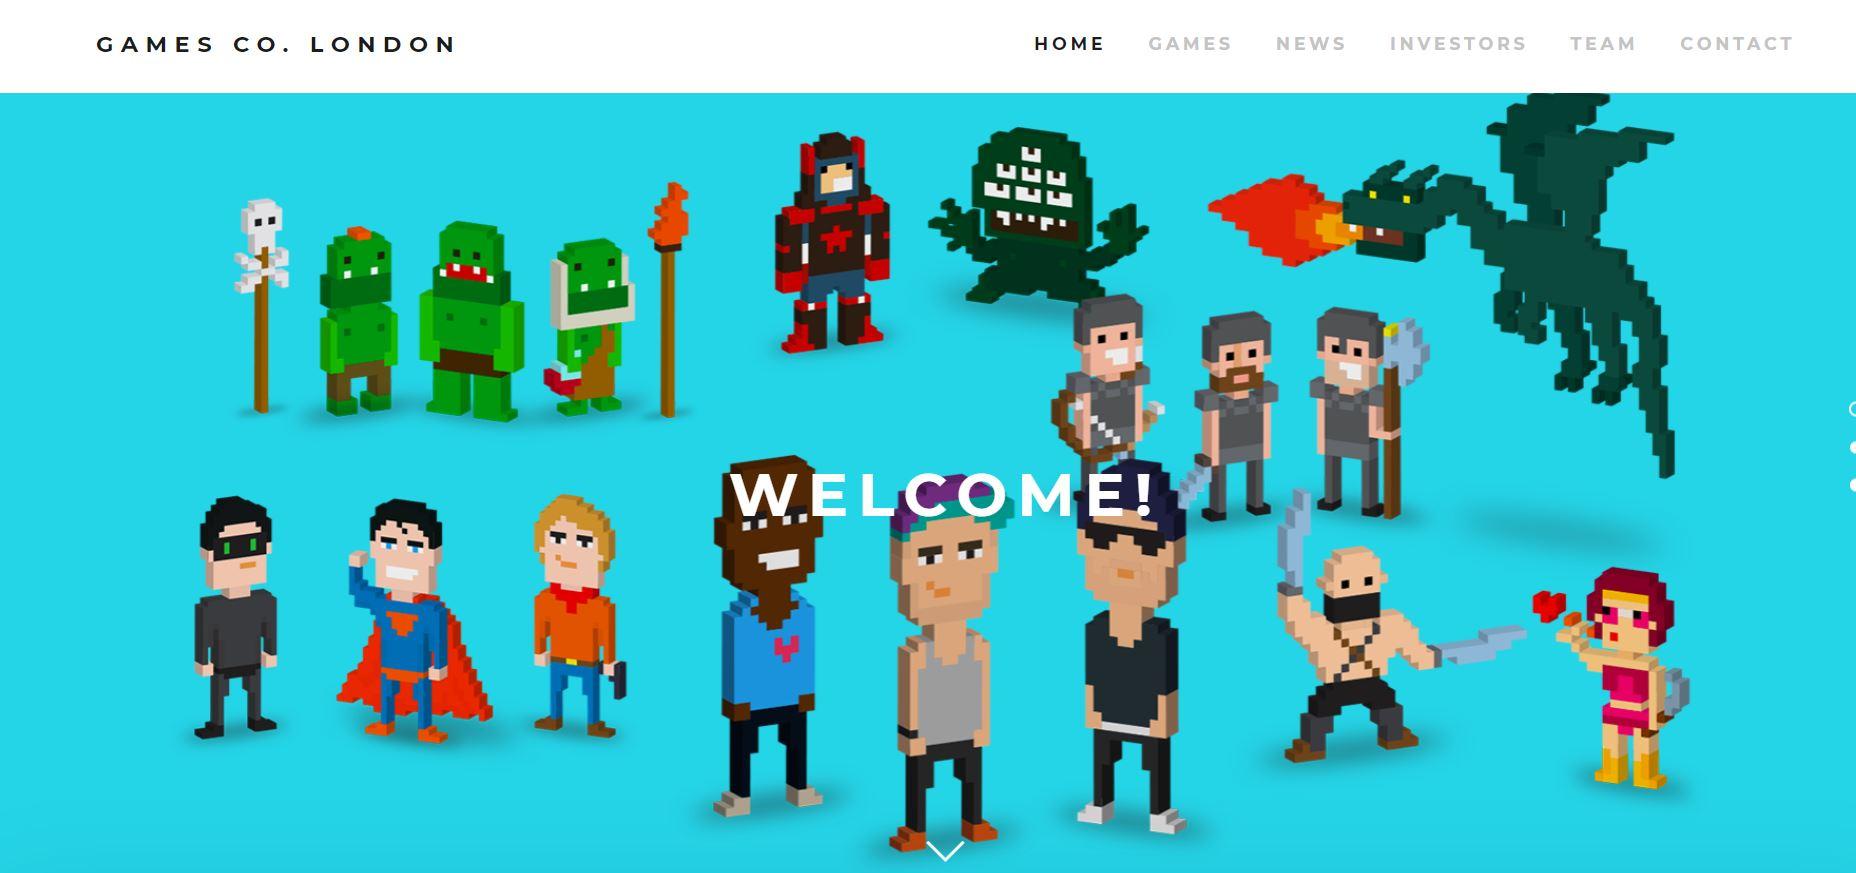 Games co London